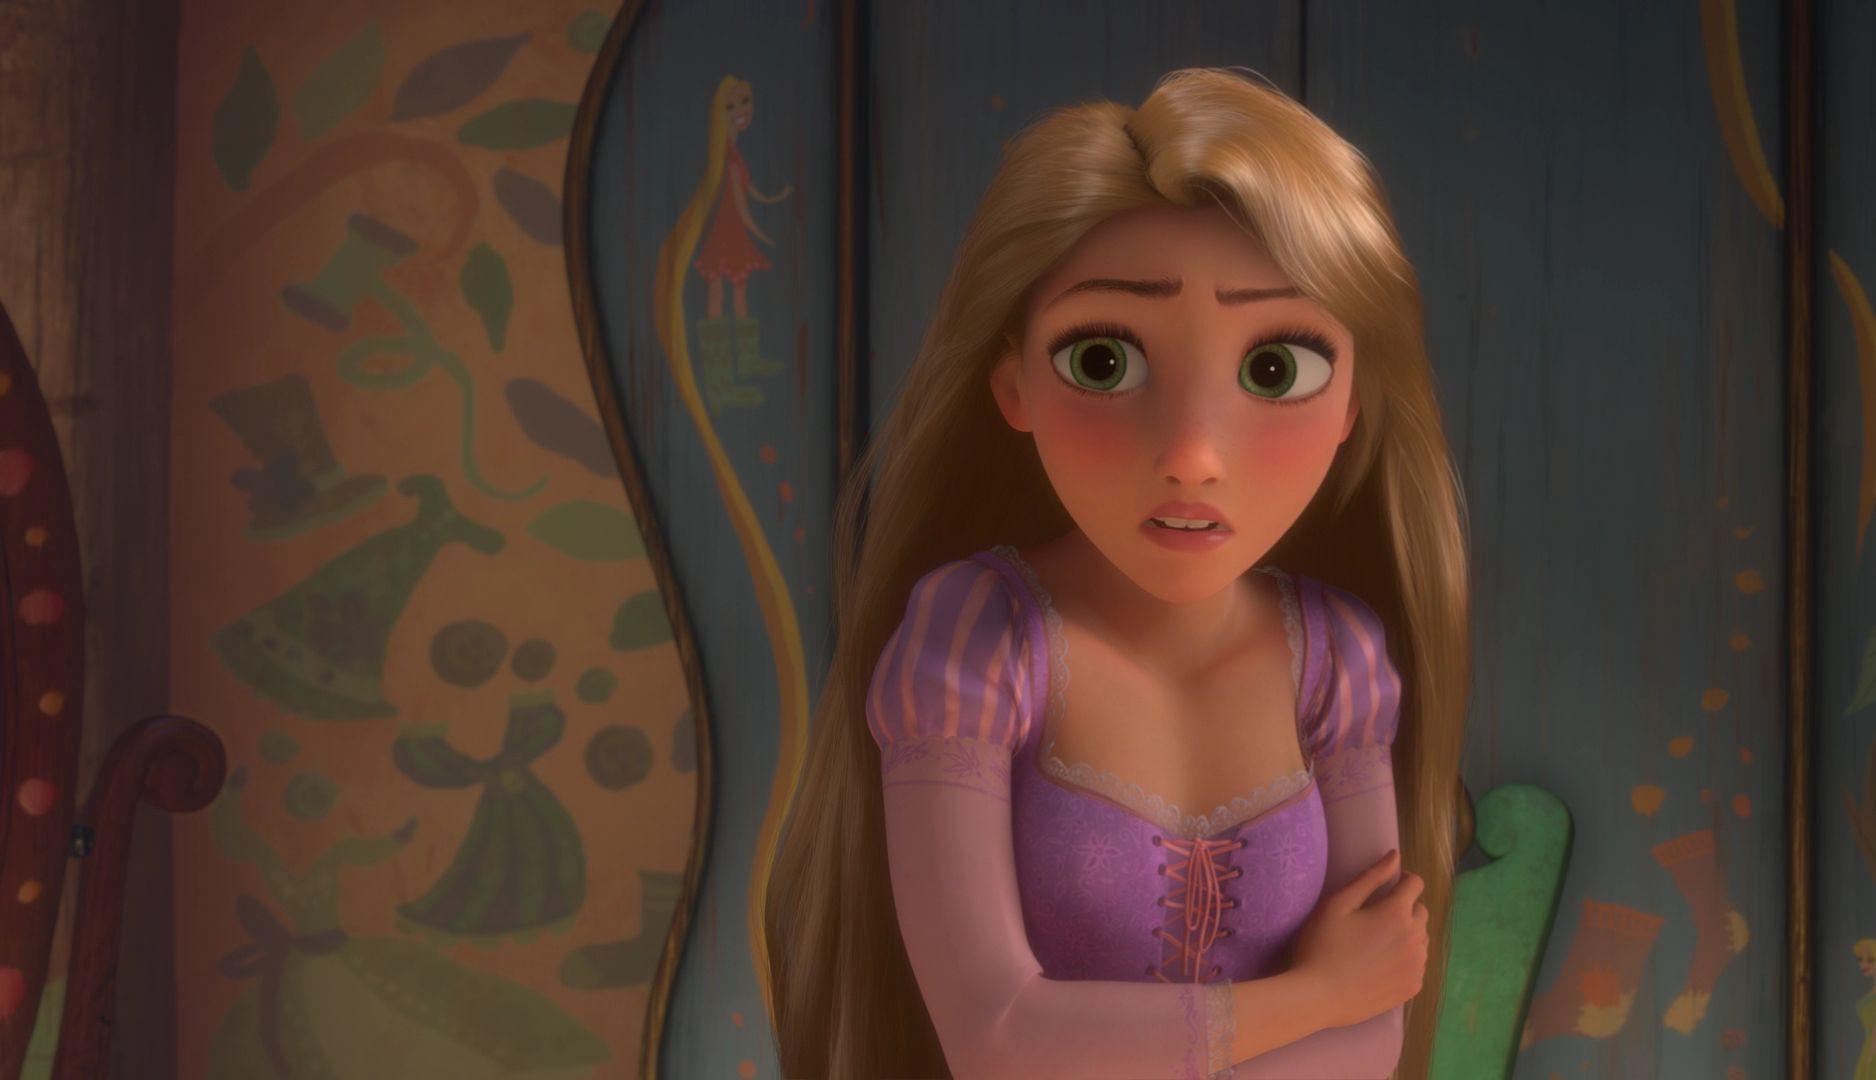 Tangled: Full Movie [Screencaps] - Tangled Image (21684975 ... Disney Rapunzel Screencaps